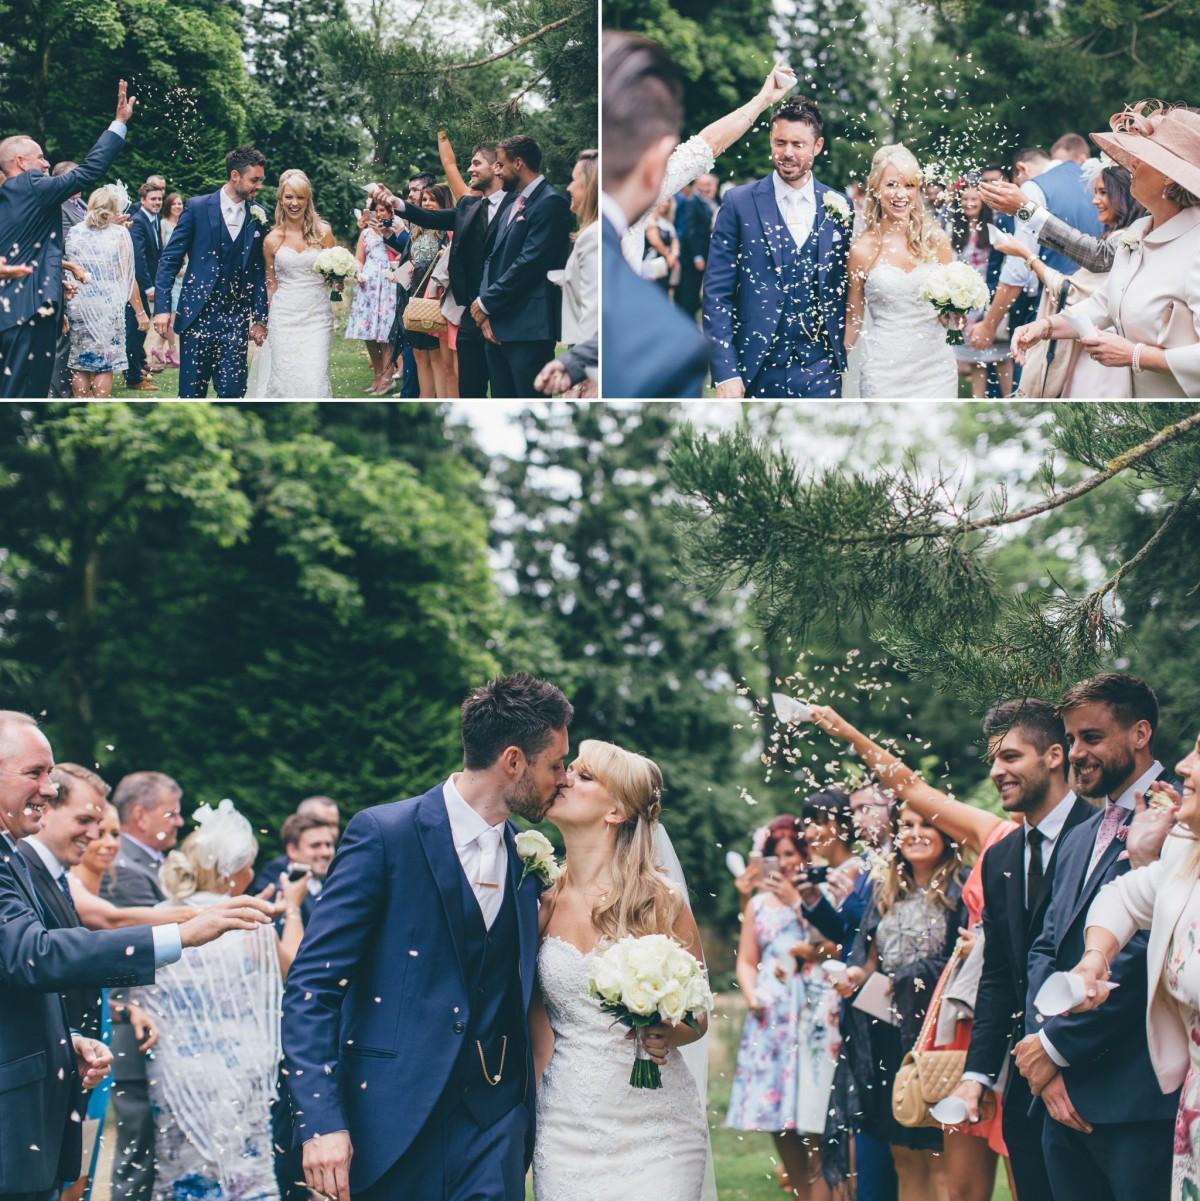 welsh_wedding_photographer_rachel_lambert_photography_lower_slaughter_manor_house_cotswolds_harriet_dean_ 28